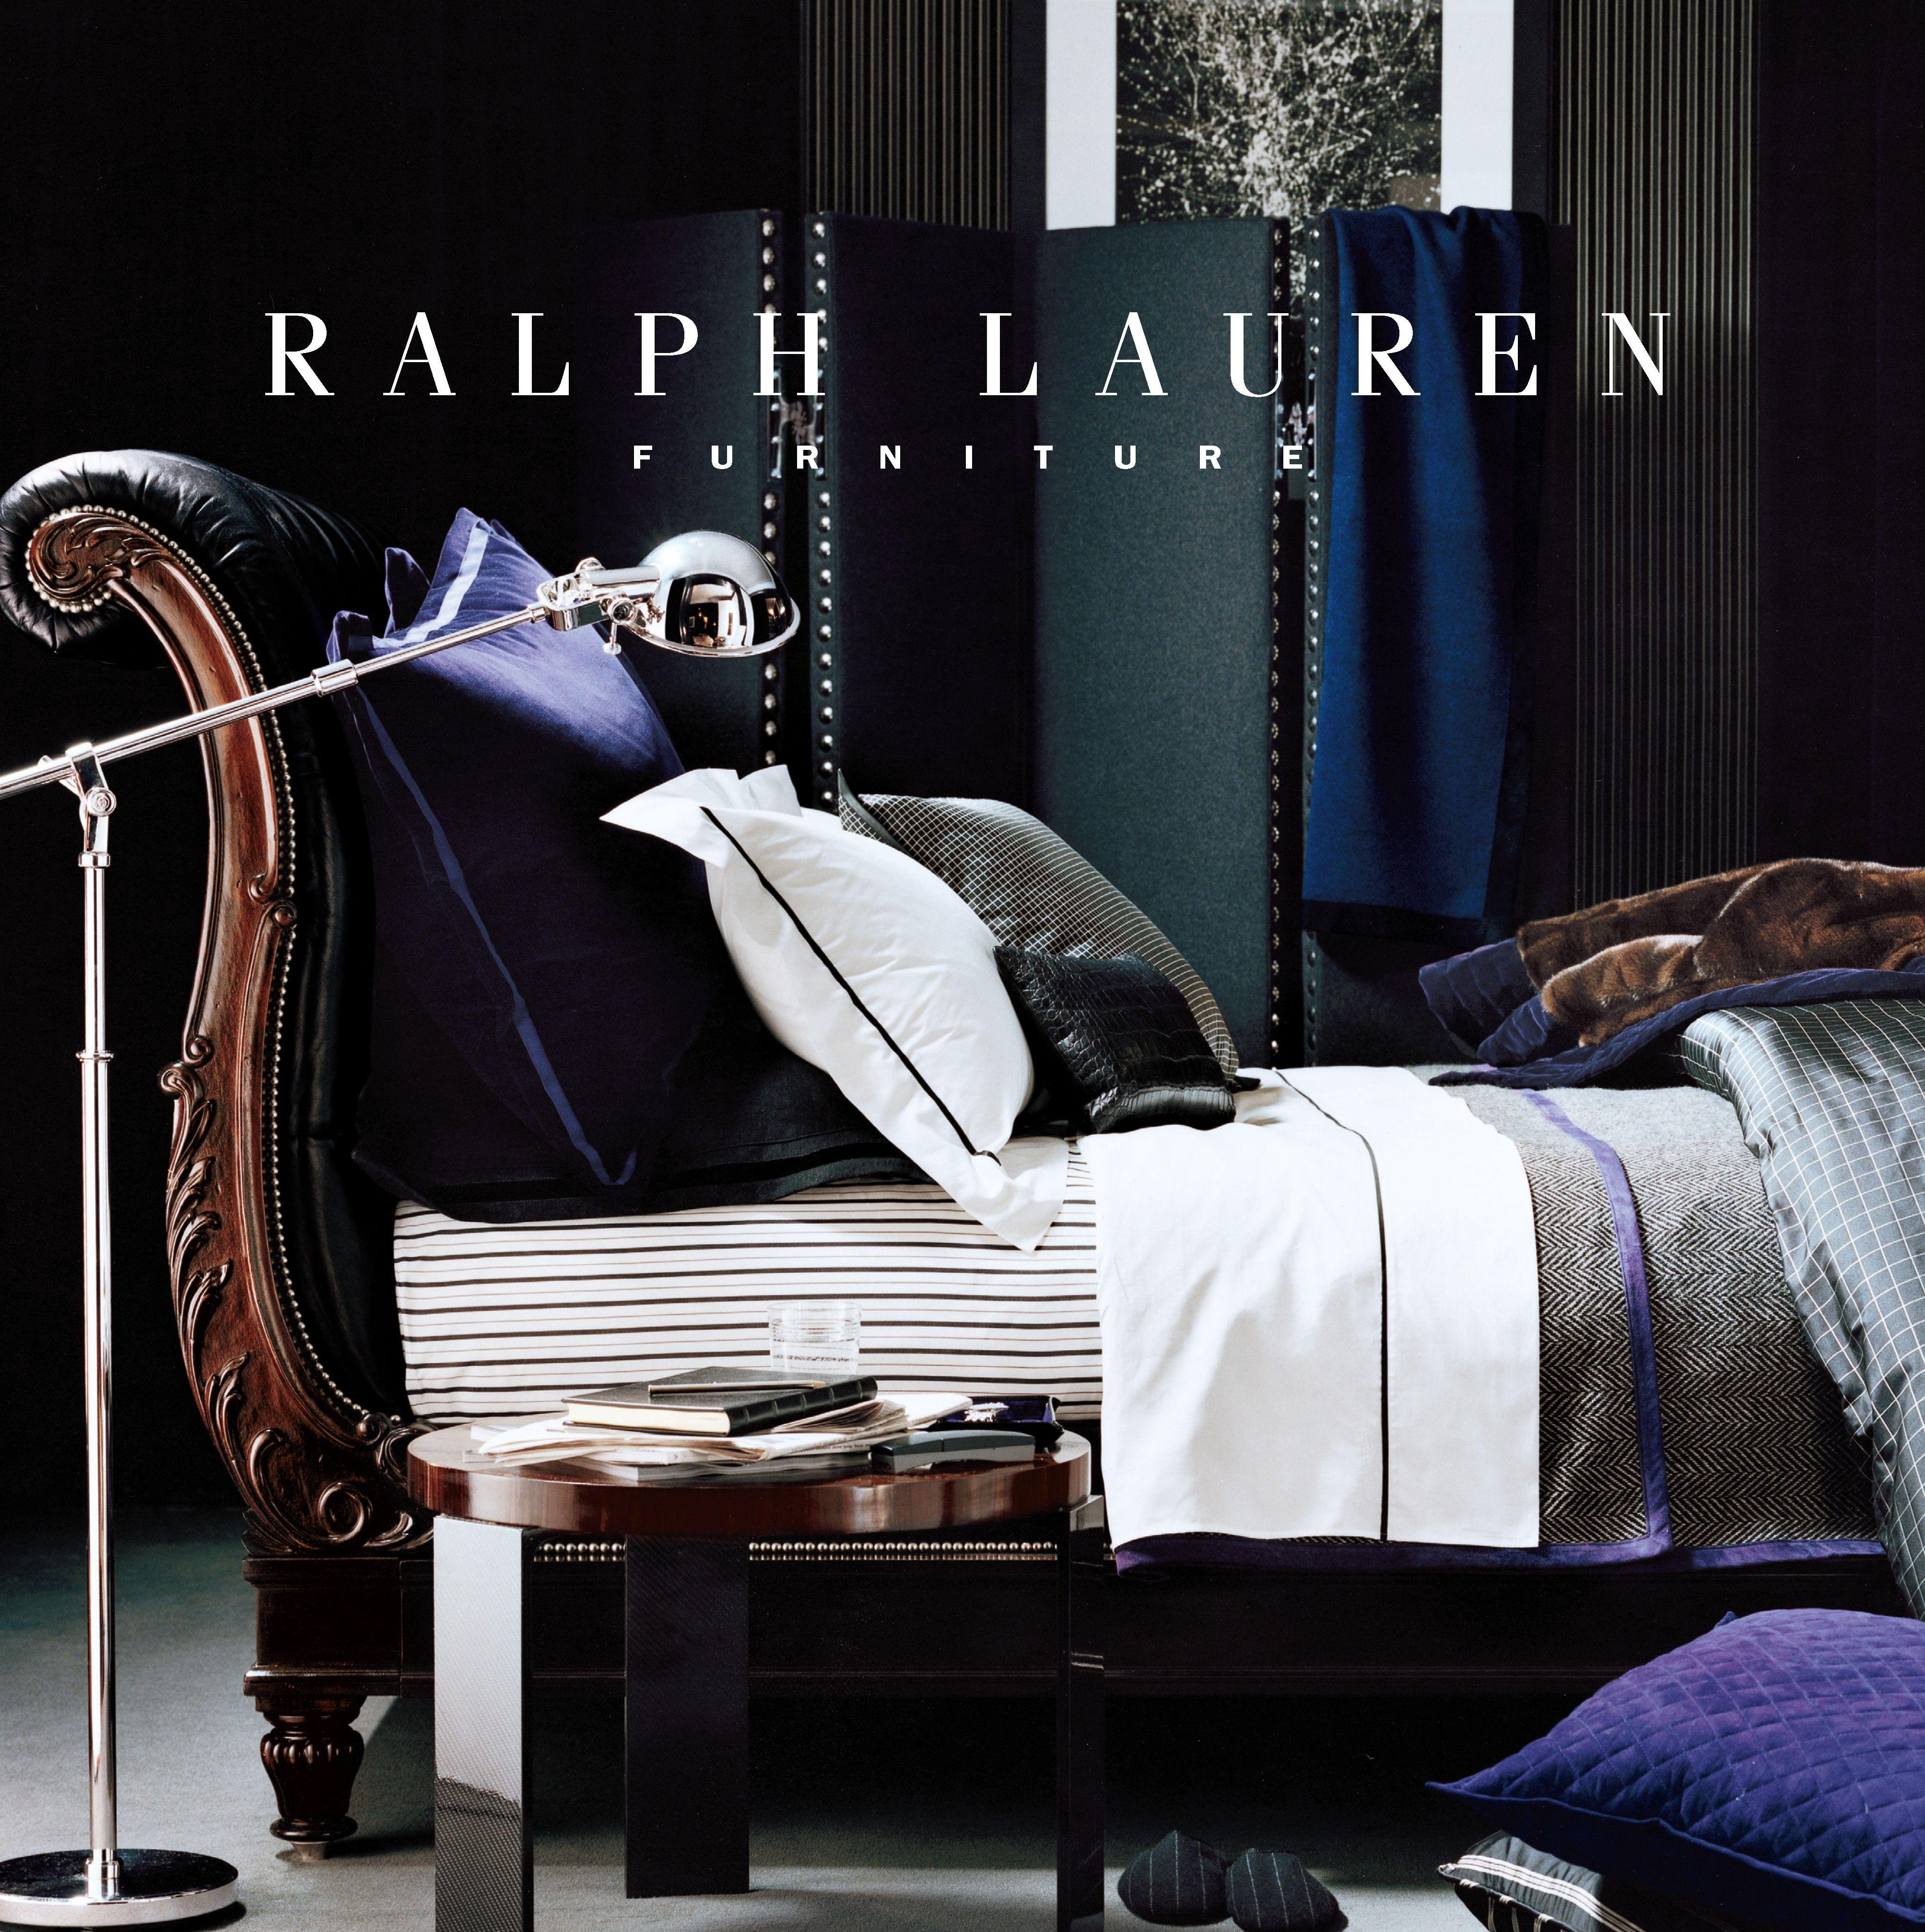 Ralph Lauren Furniture | Our Work | Pinterest